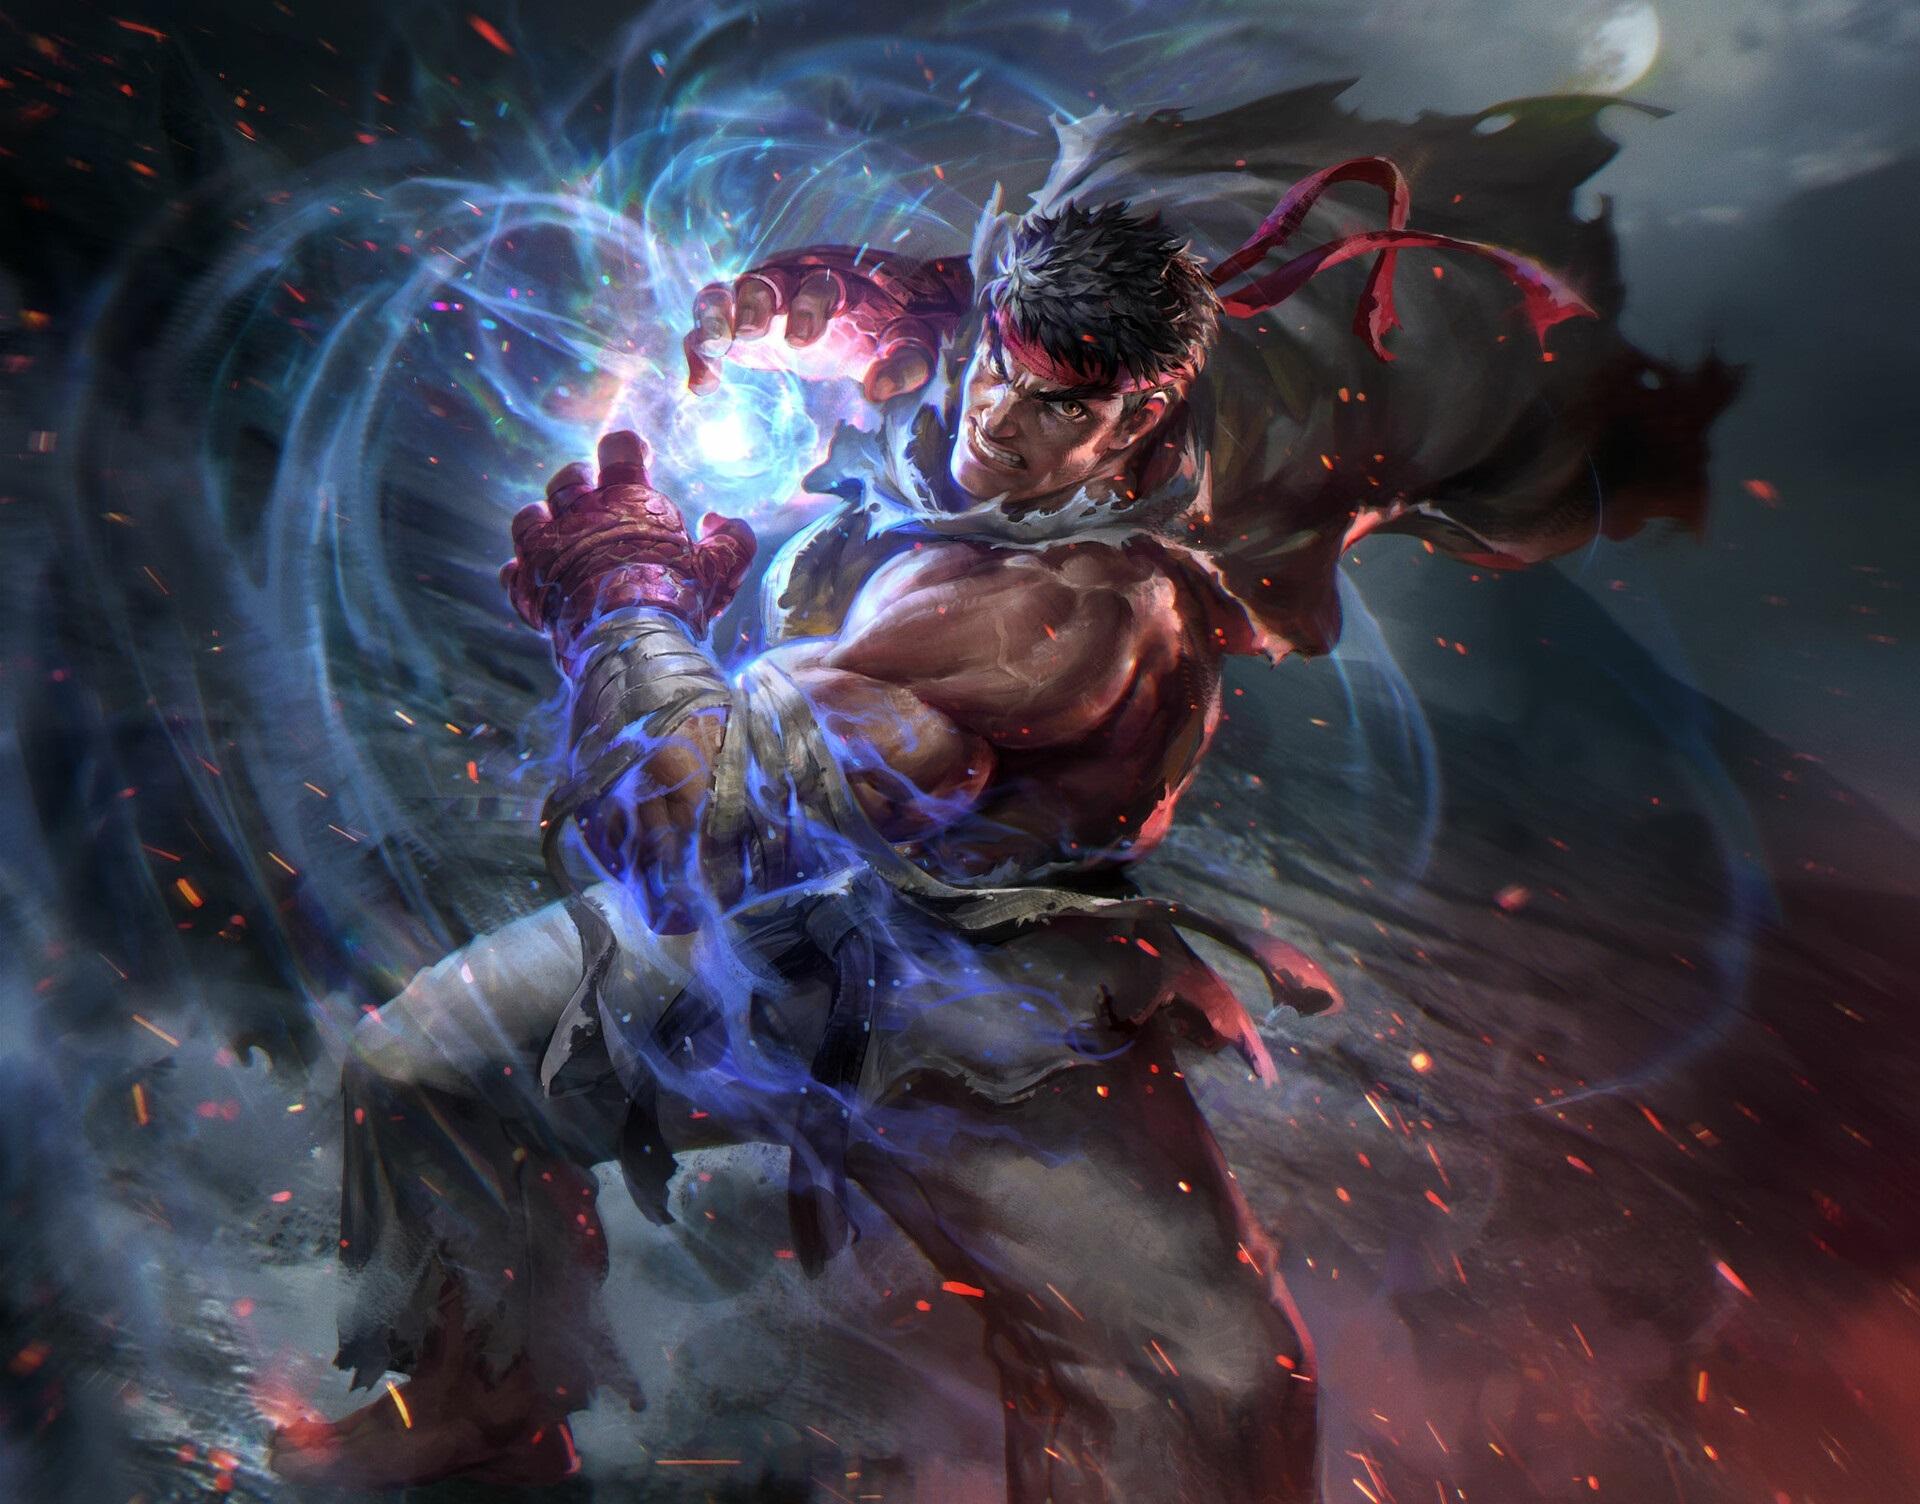 Ryu Street Fighter Wallpaper, HD Games 4K Wallpapers ...